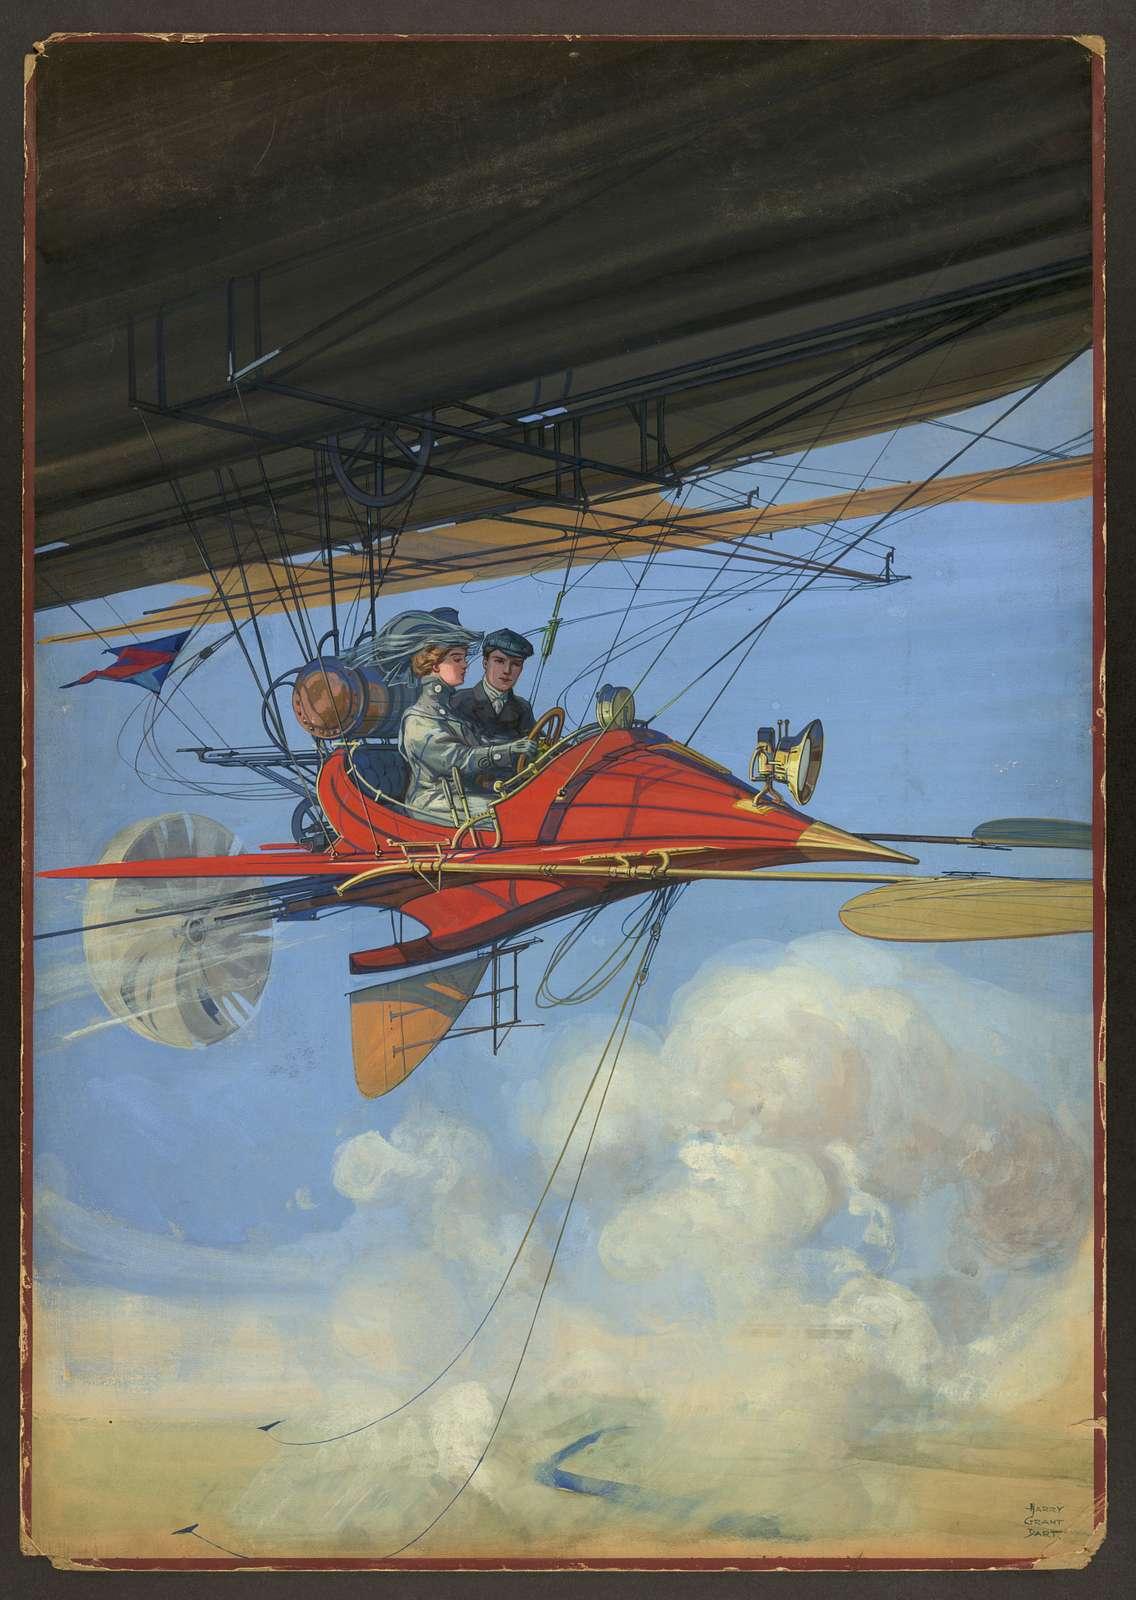 [Futuristic air travel] / Harry Grant Dart.